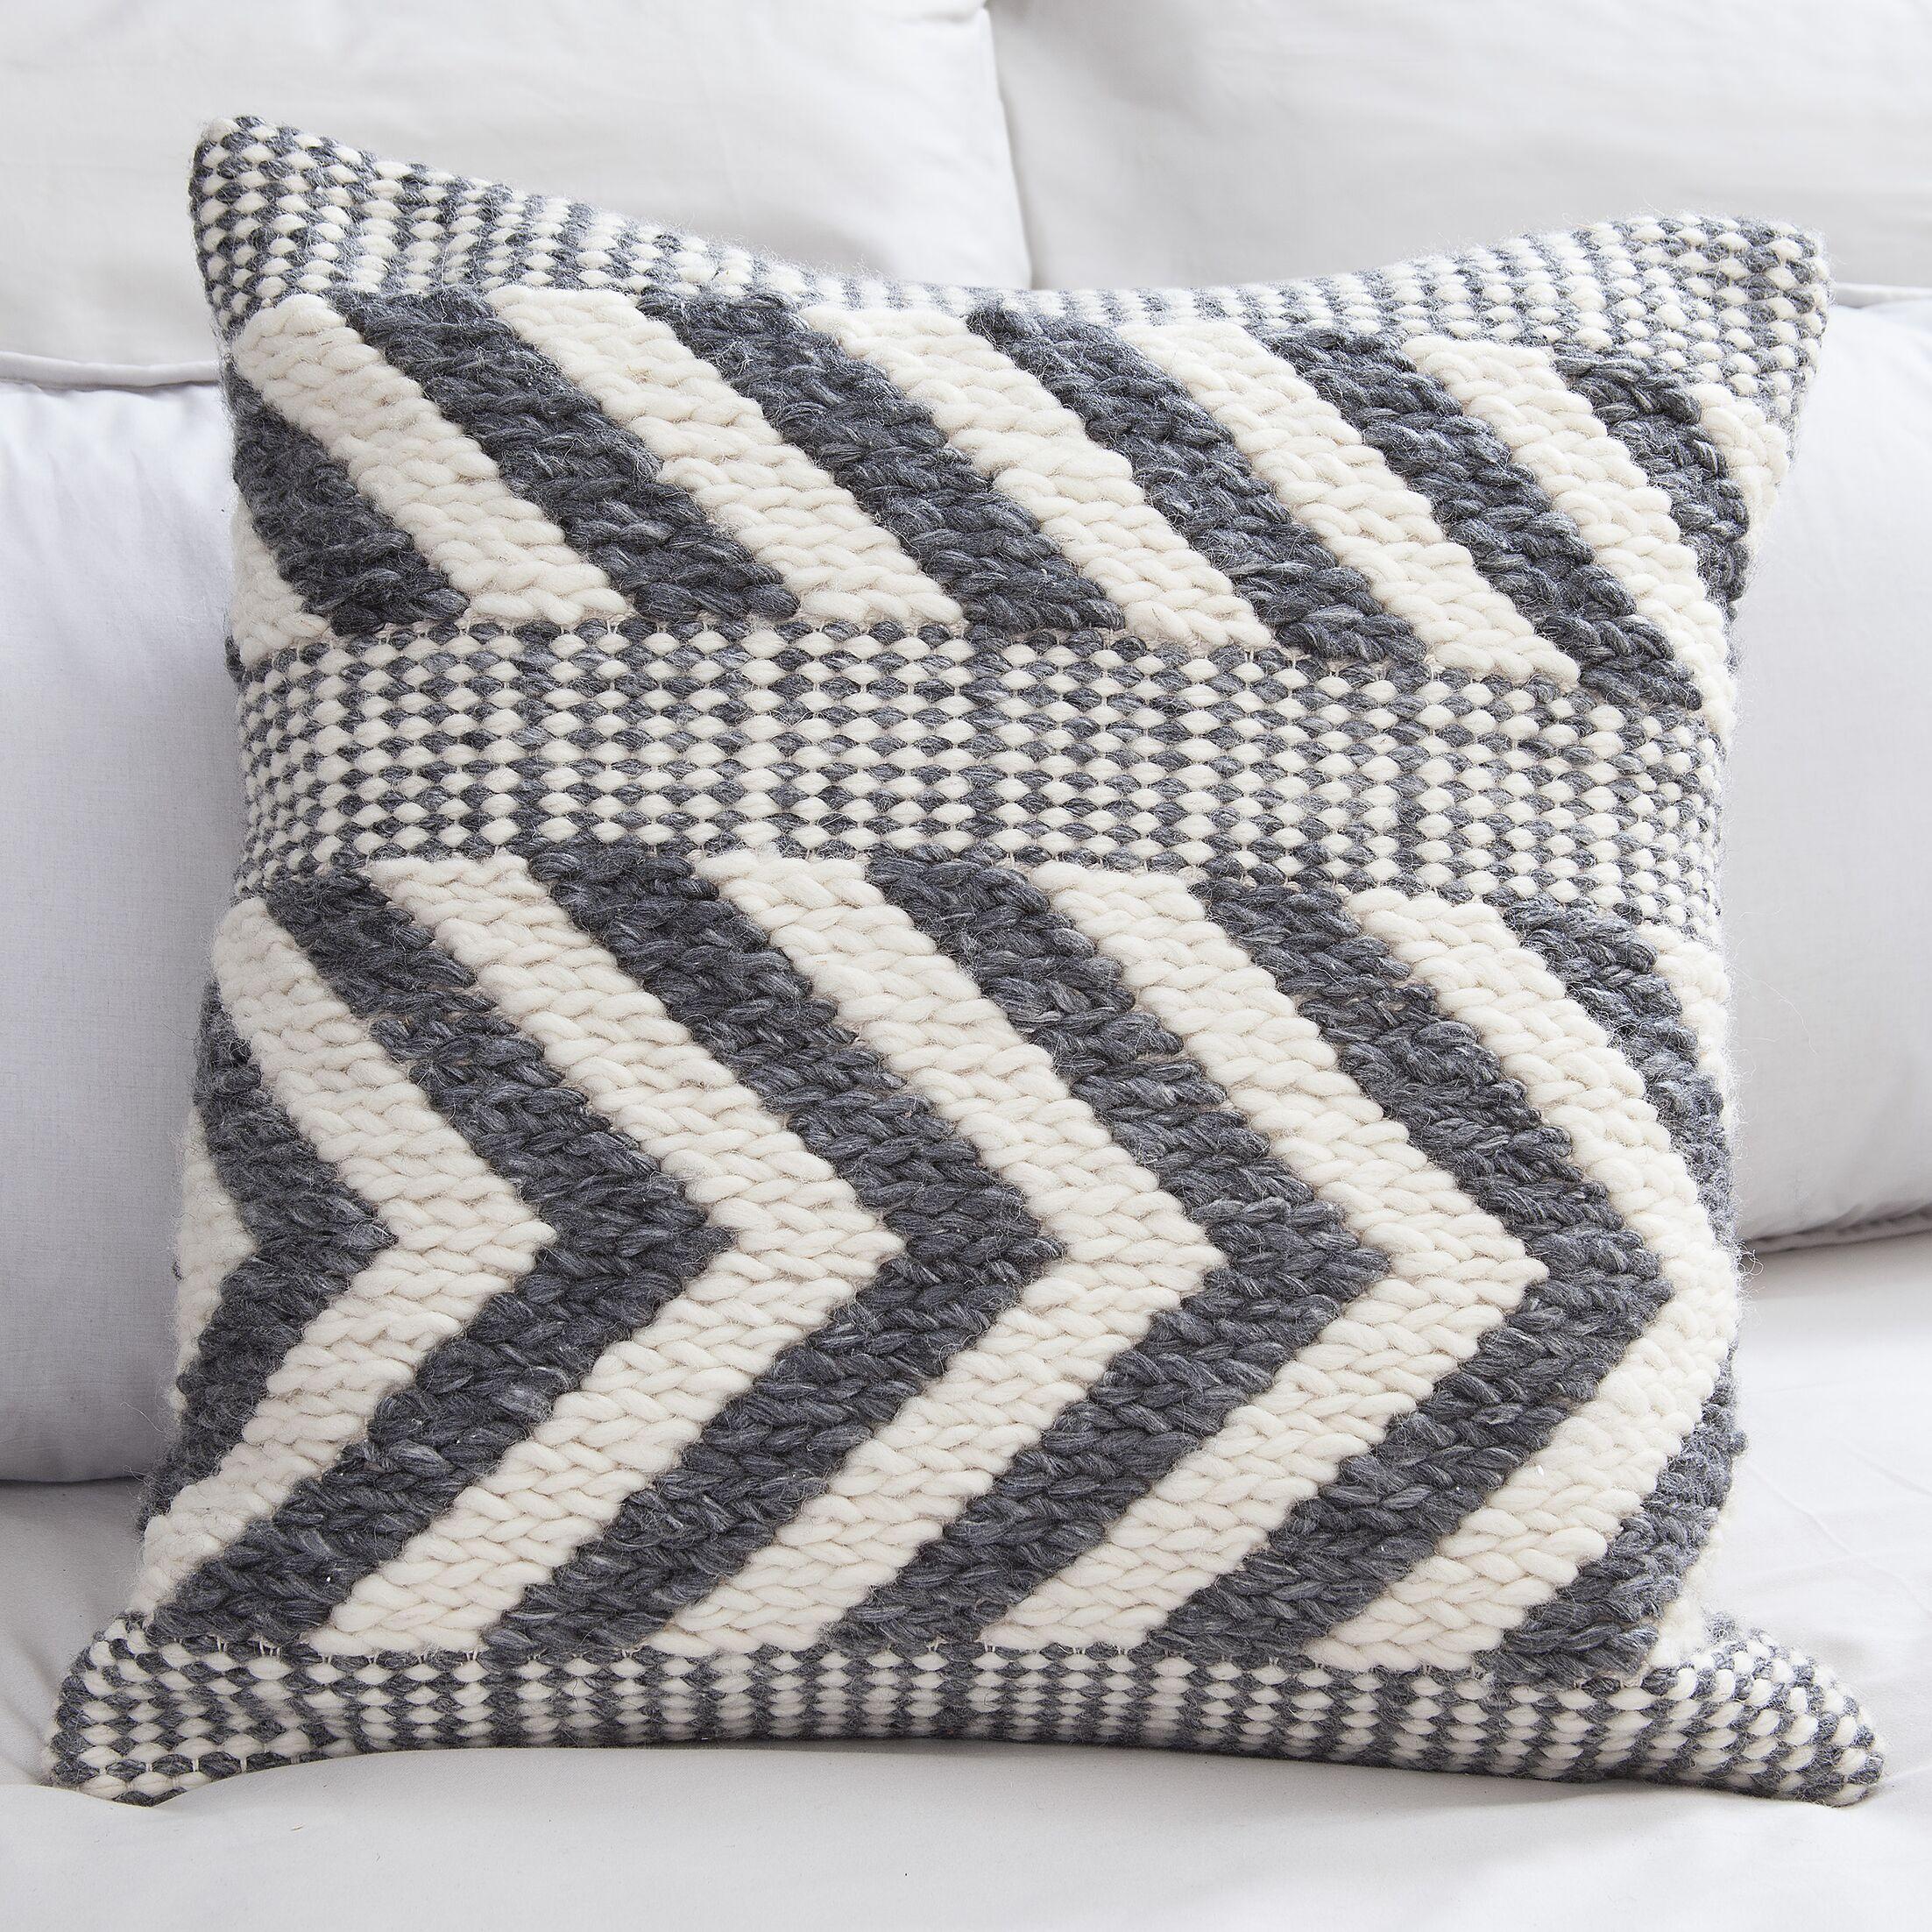 Martucci Throw Pillow